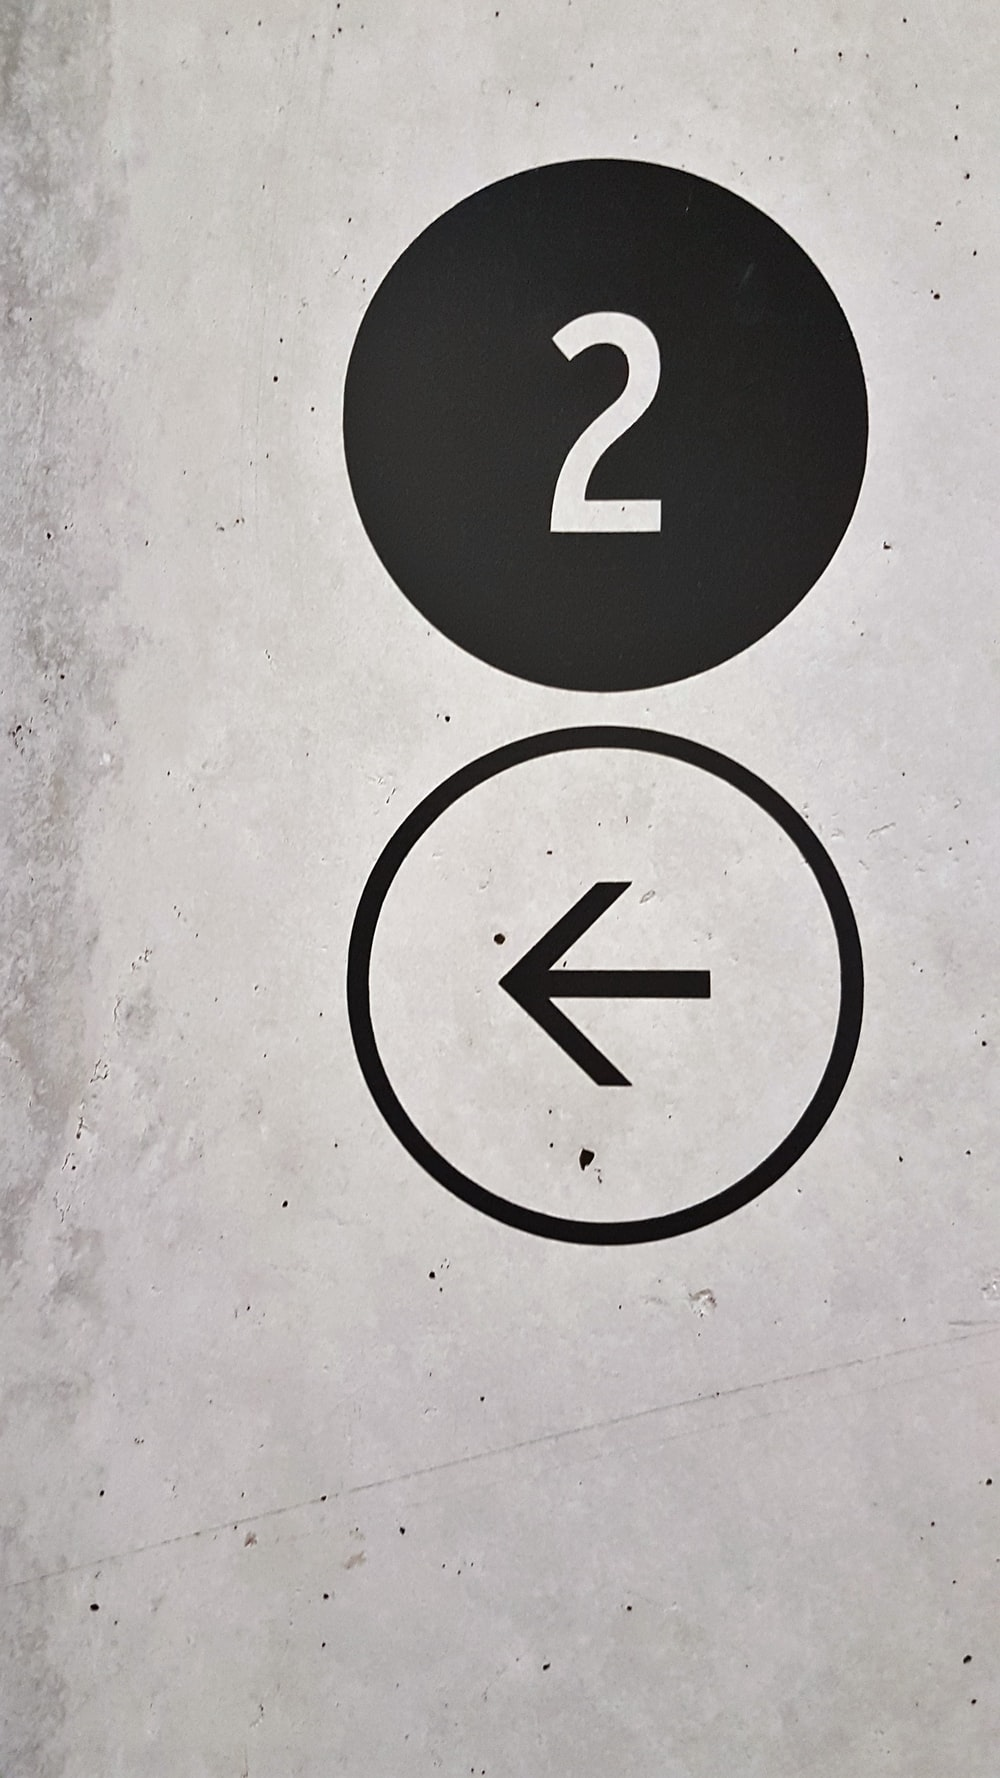 elevator indicator at 2